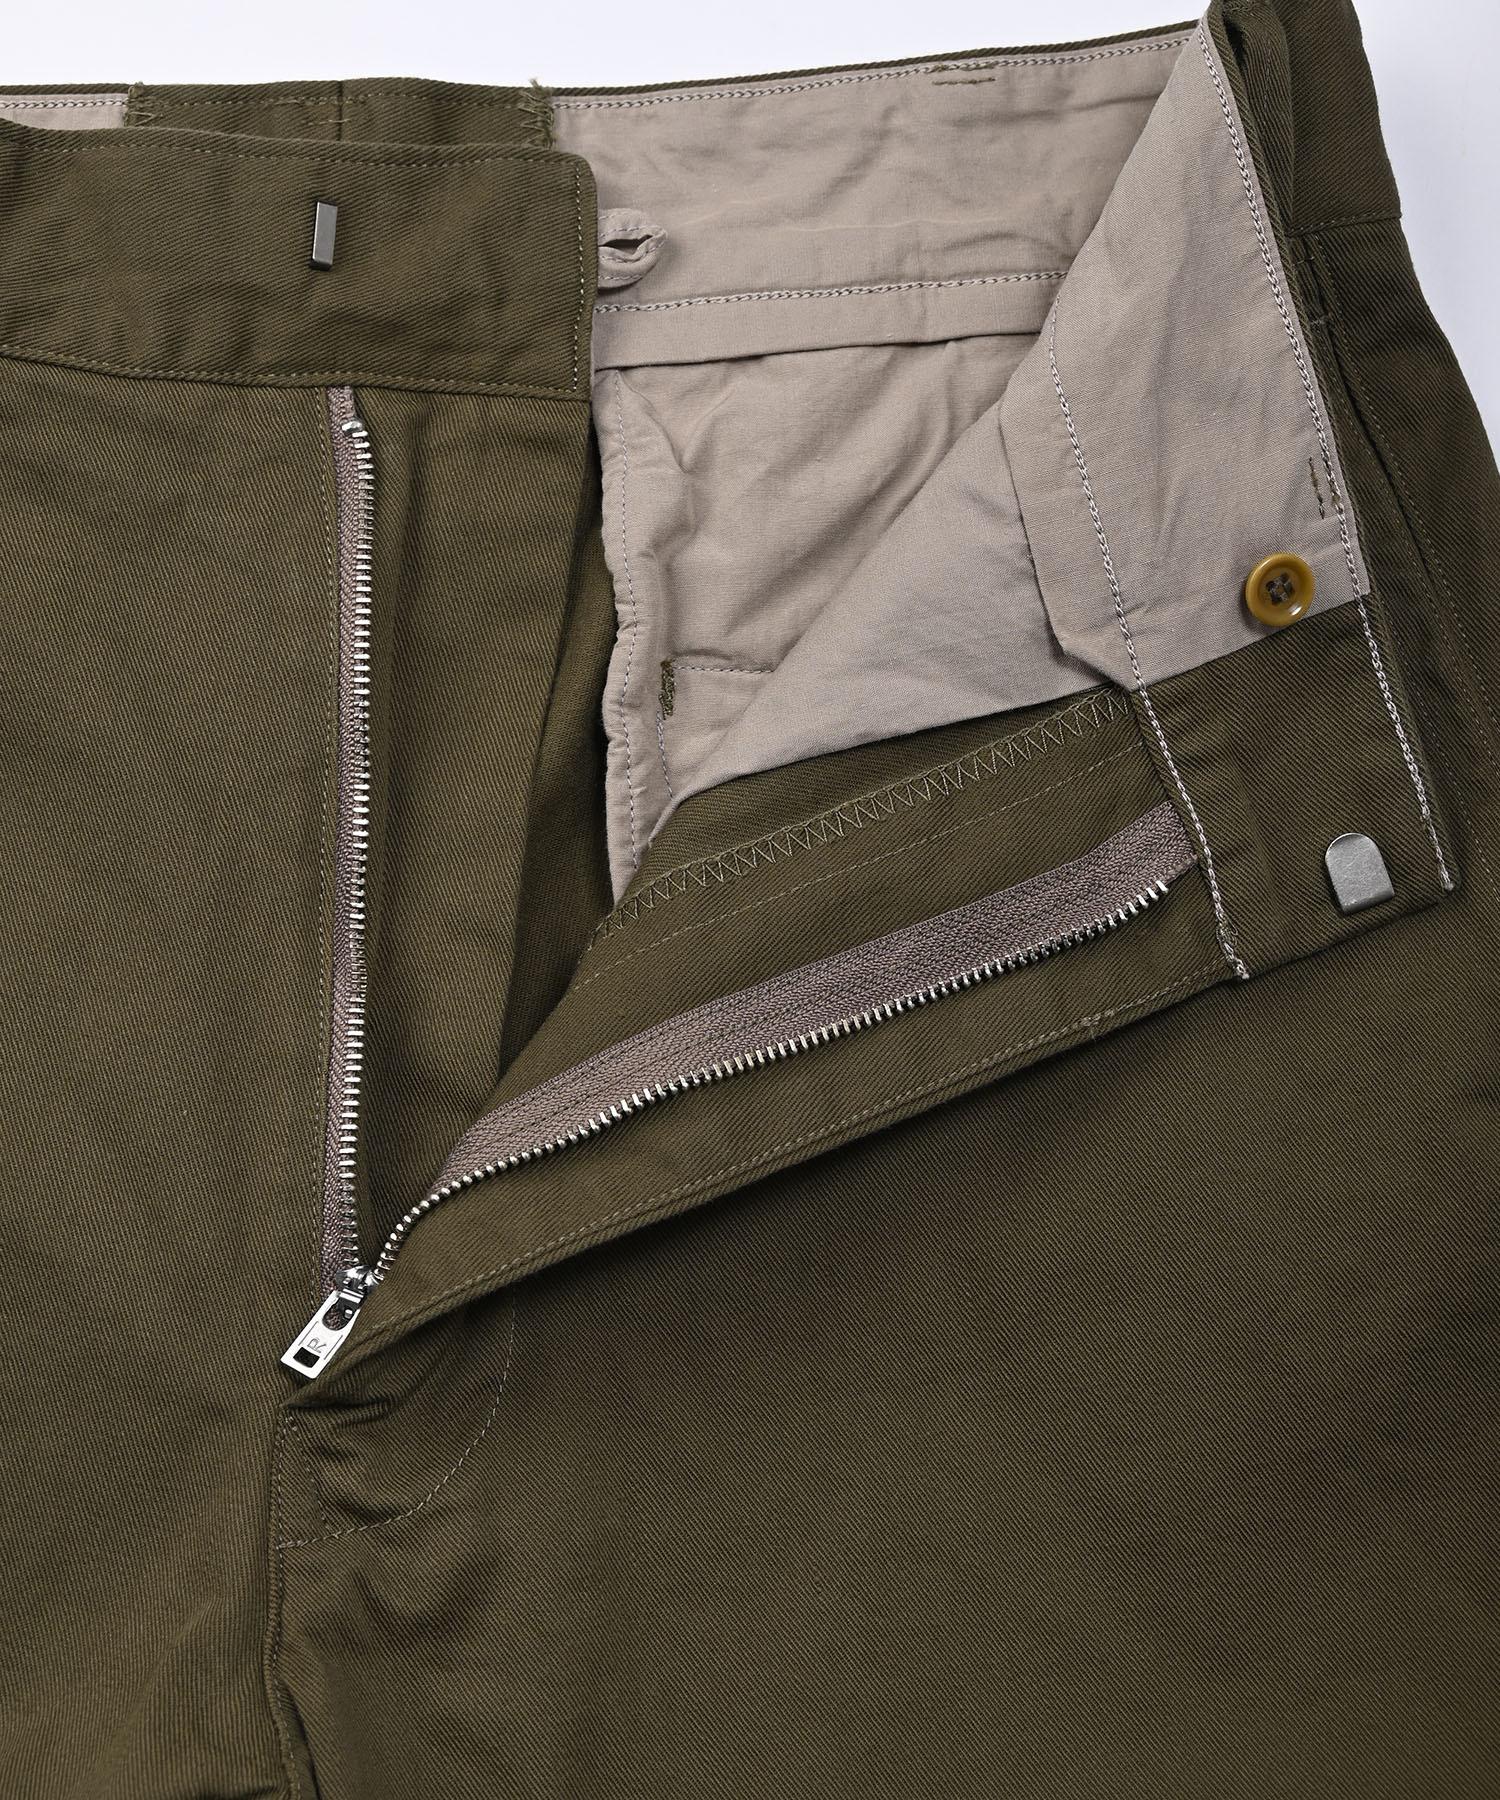 Okome Chino 908 Pants (0421)-4